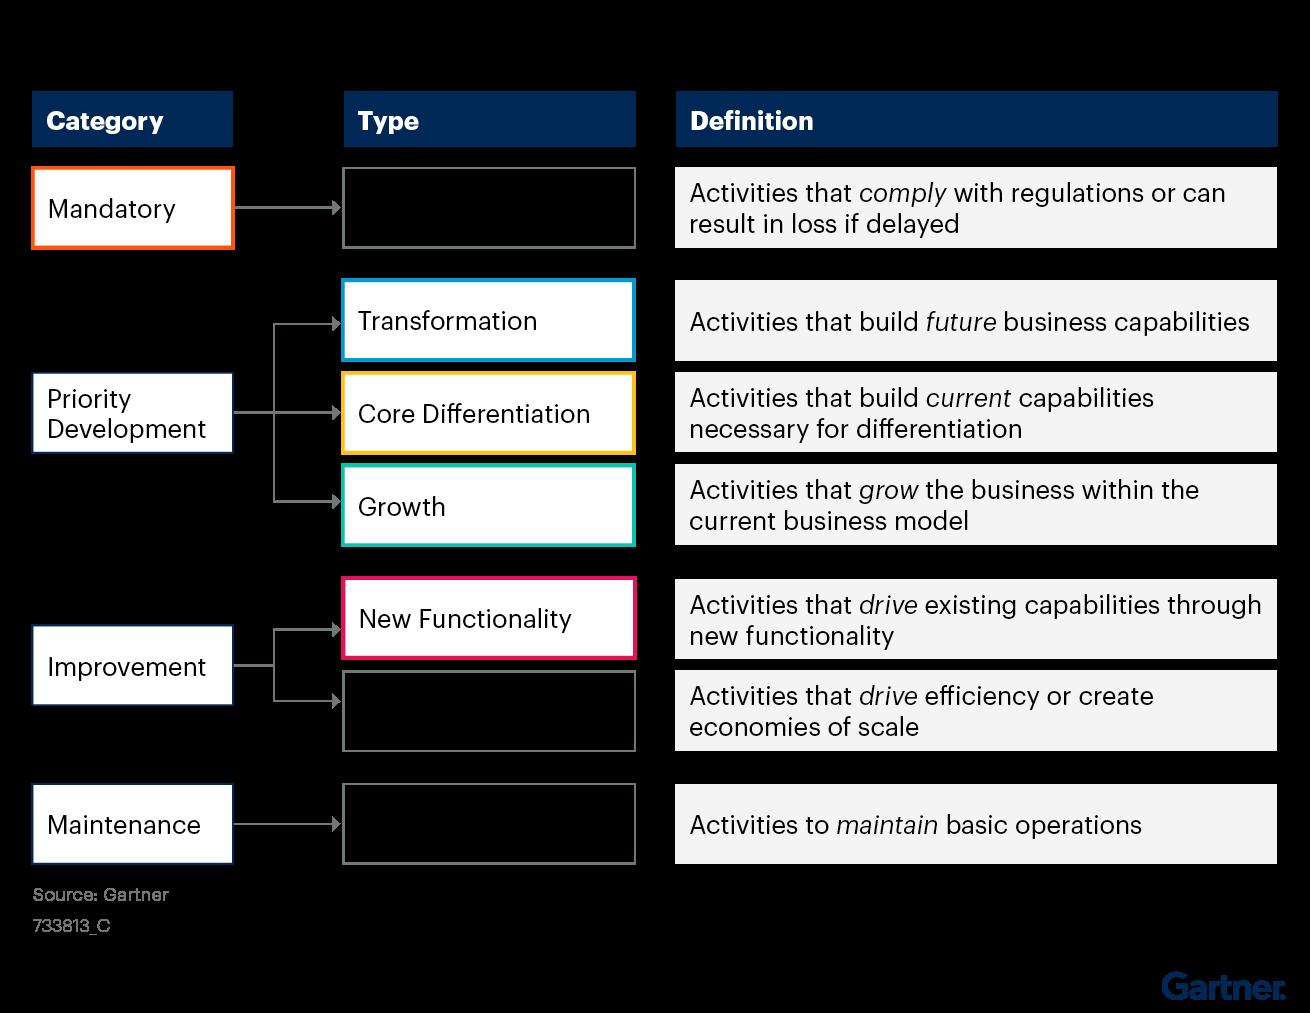 Figure 2. Prioritization Framework for ZBB